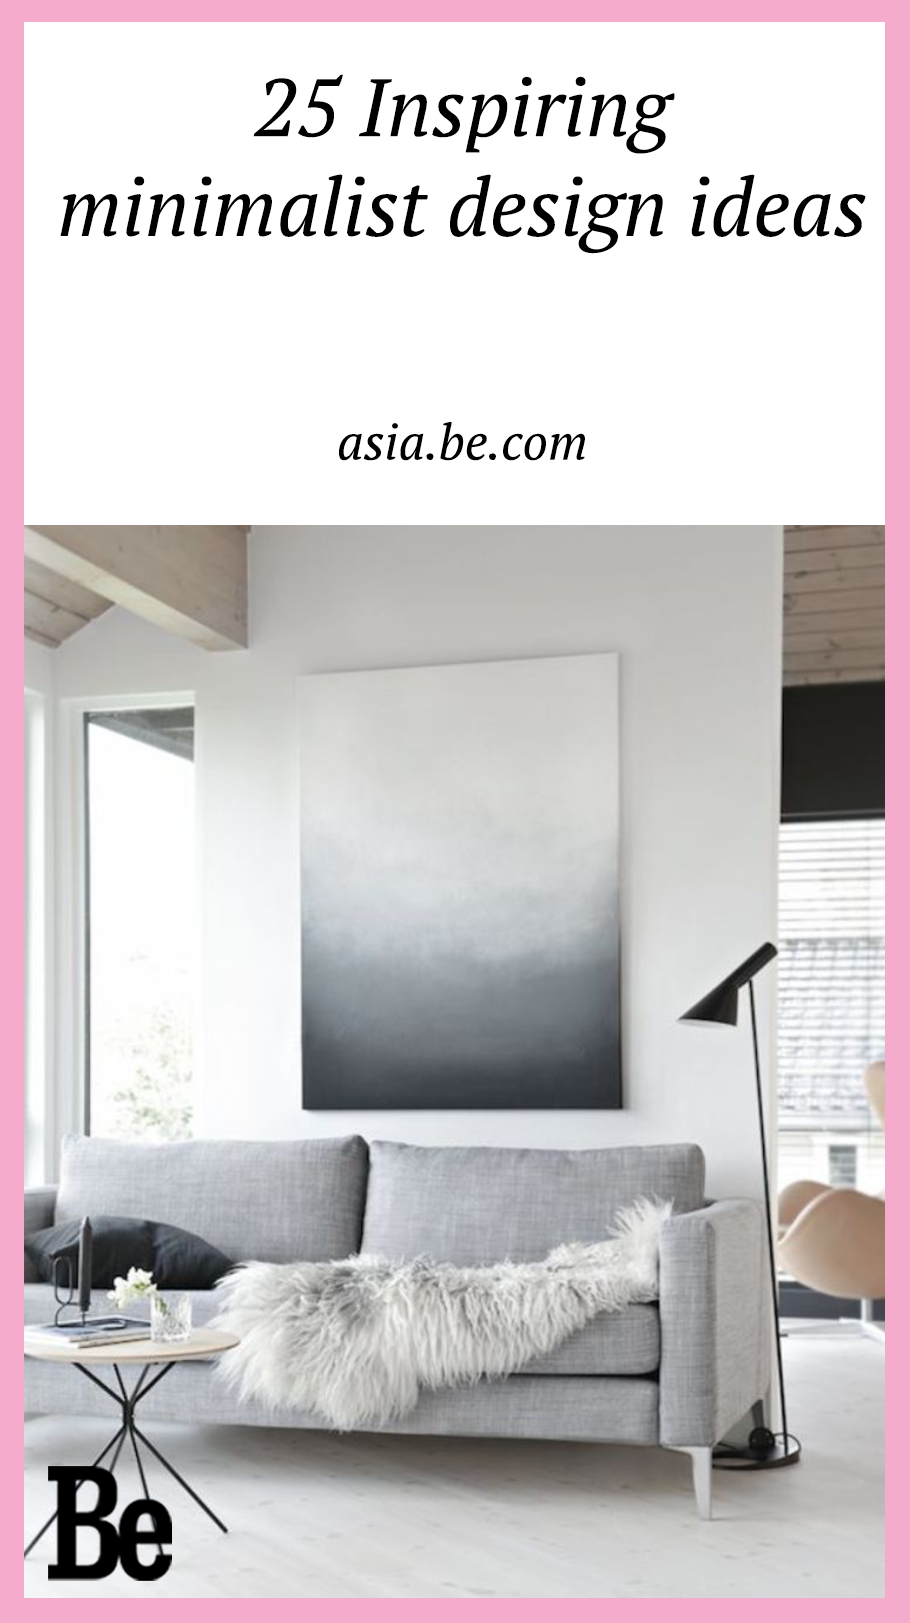 #design #minimalist #home #decor